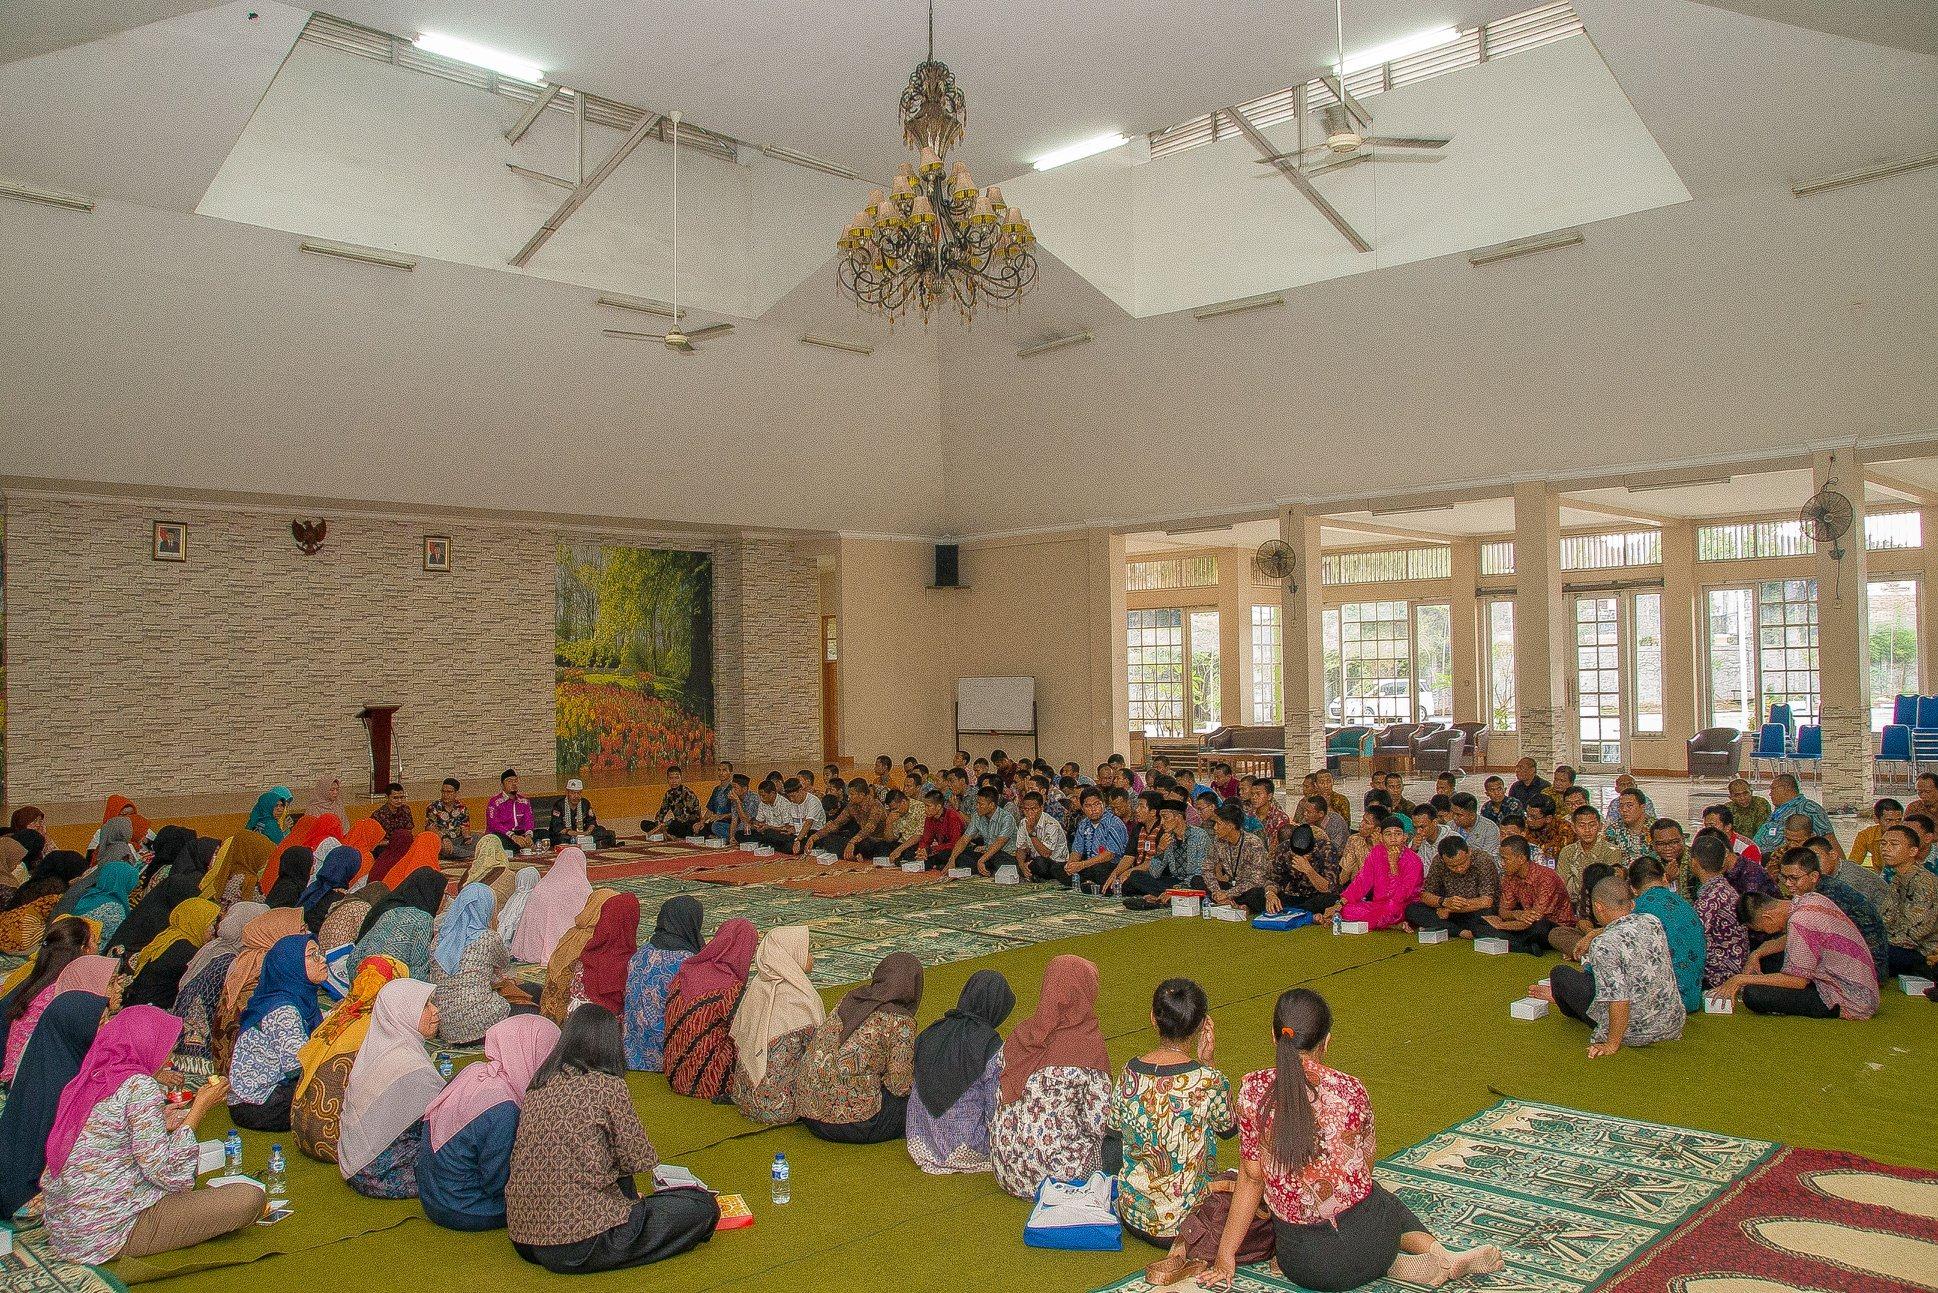 Sambut Ramadhan, BBPLK Bekasi Gelar Acara Munggahan